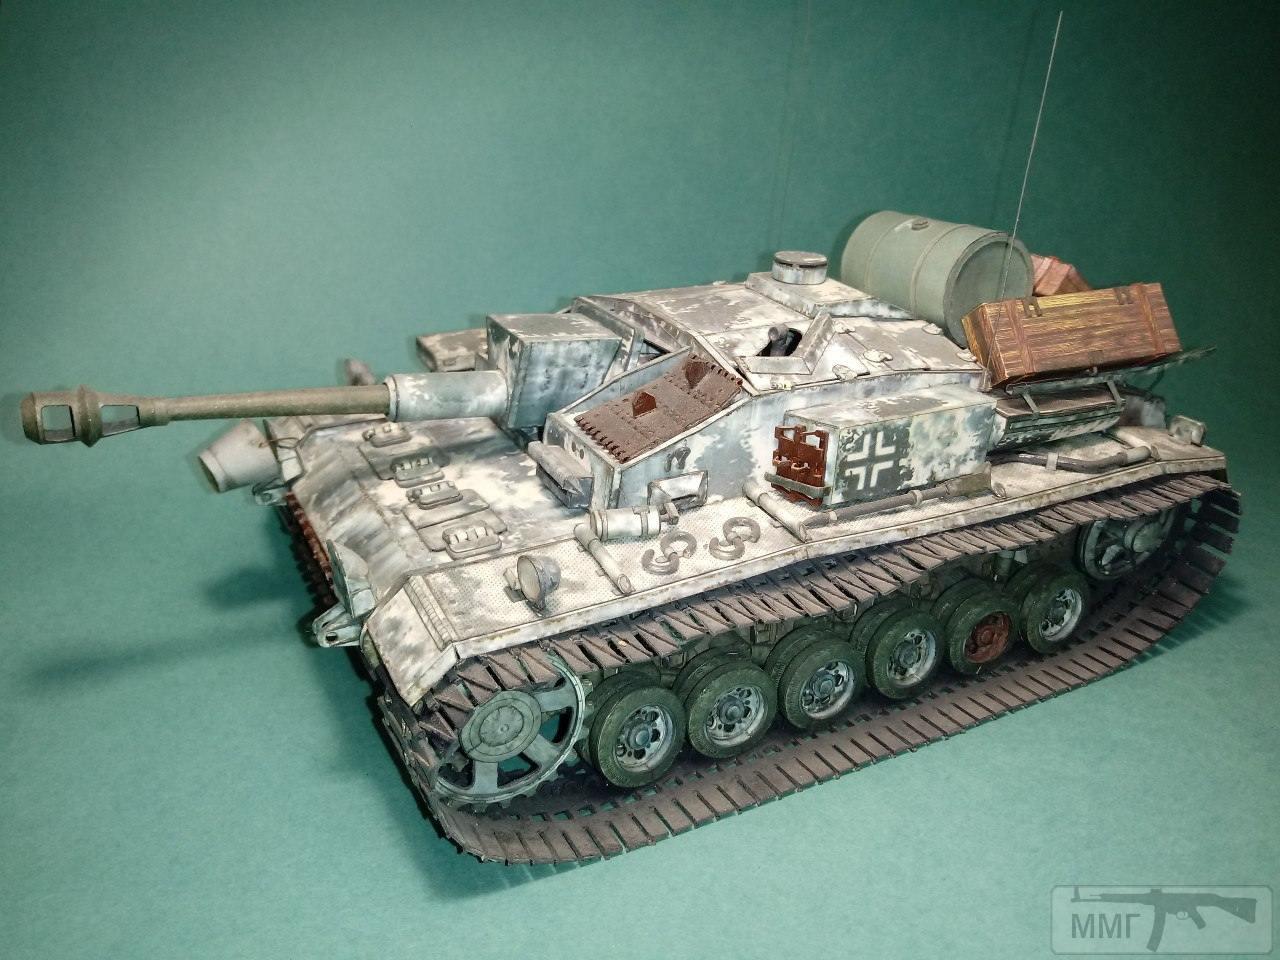 20409 - StuG III. 1/25. Бумага.